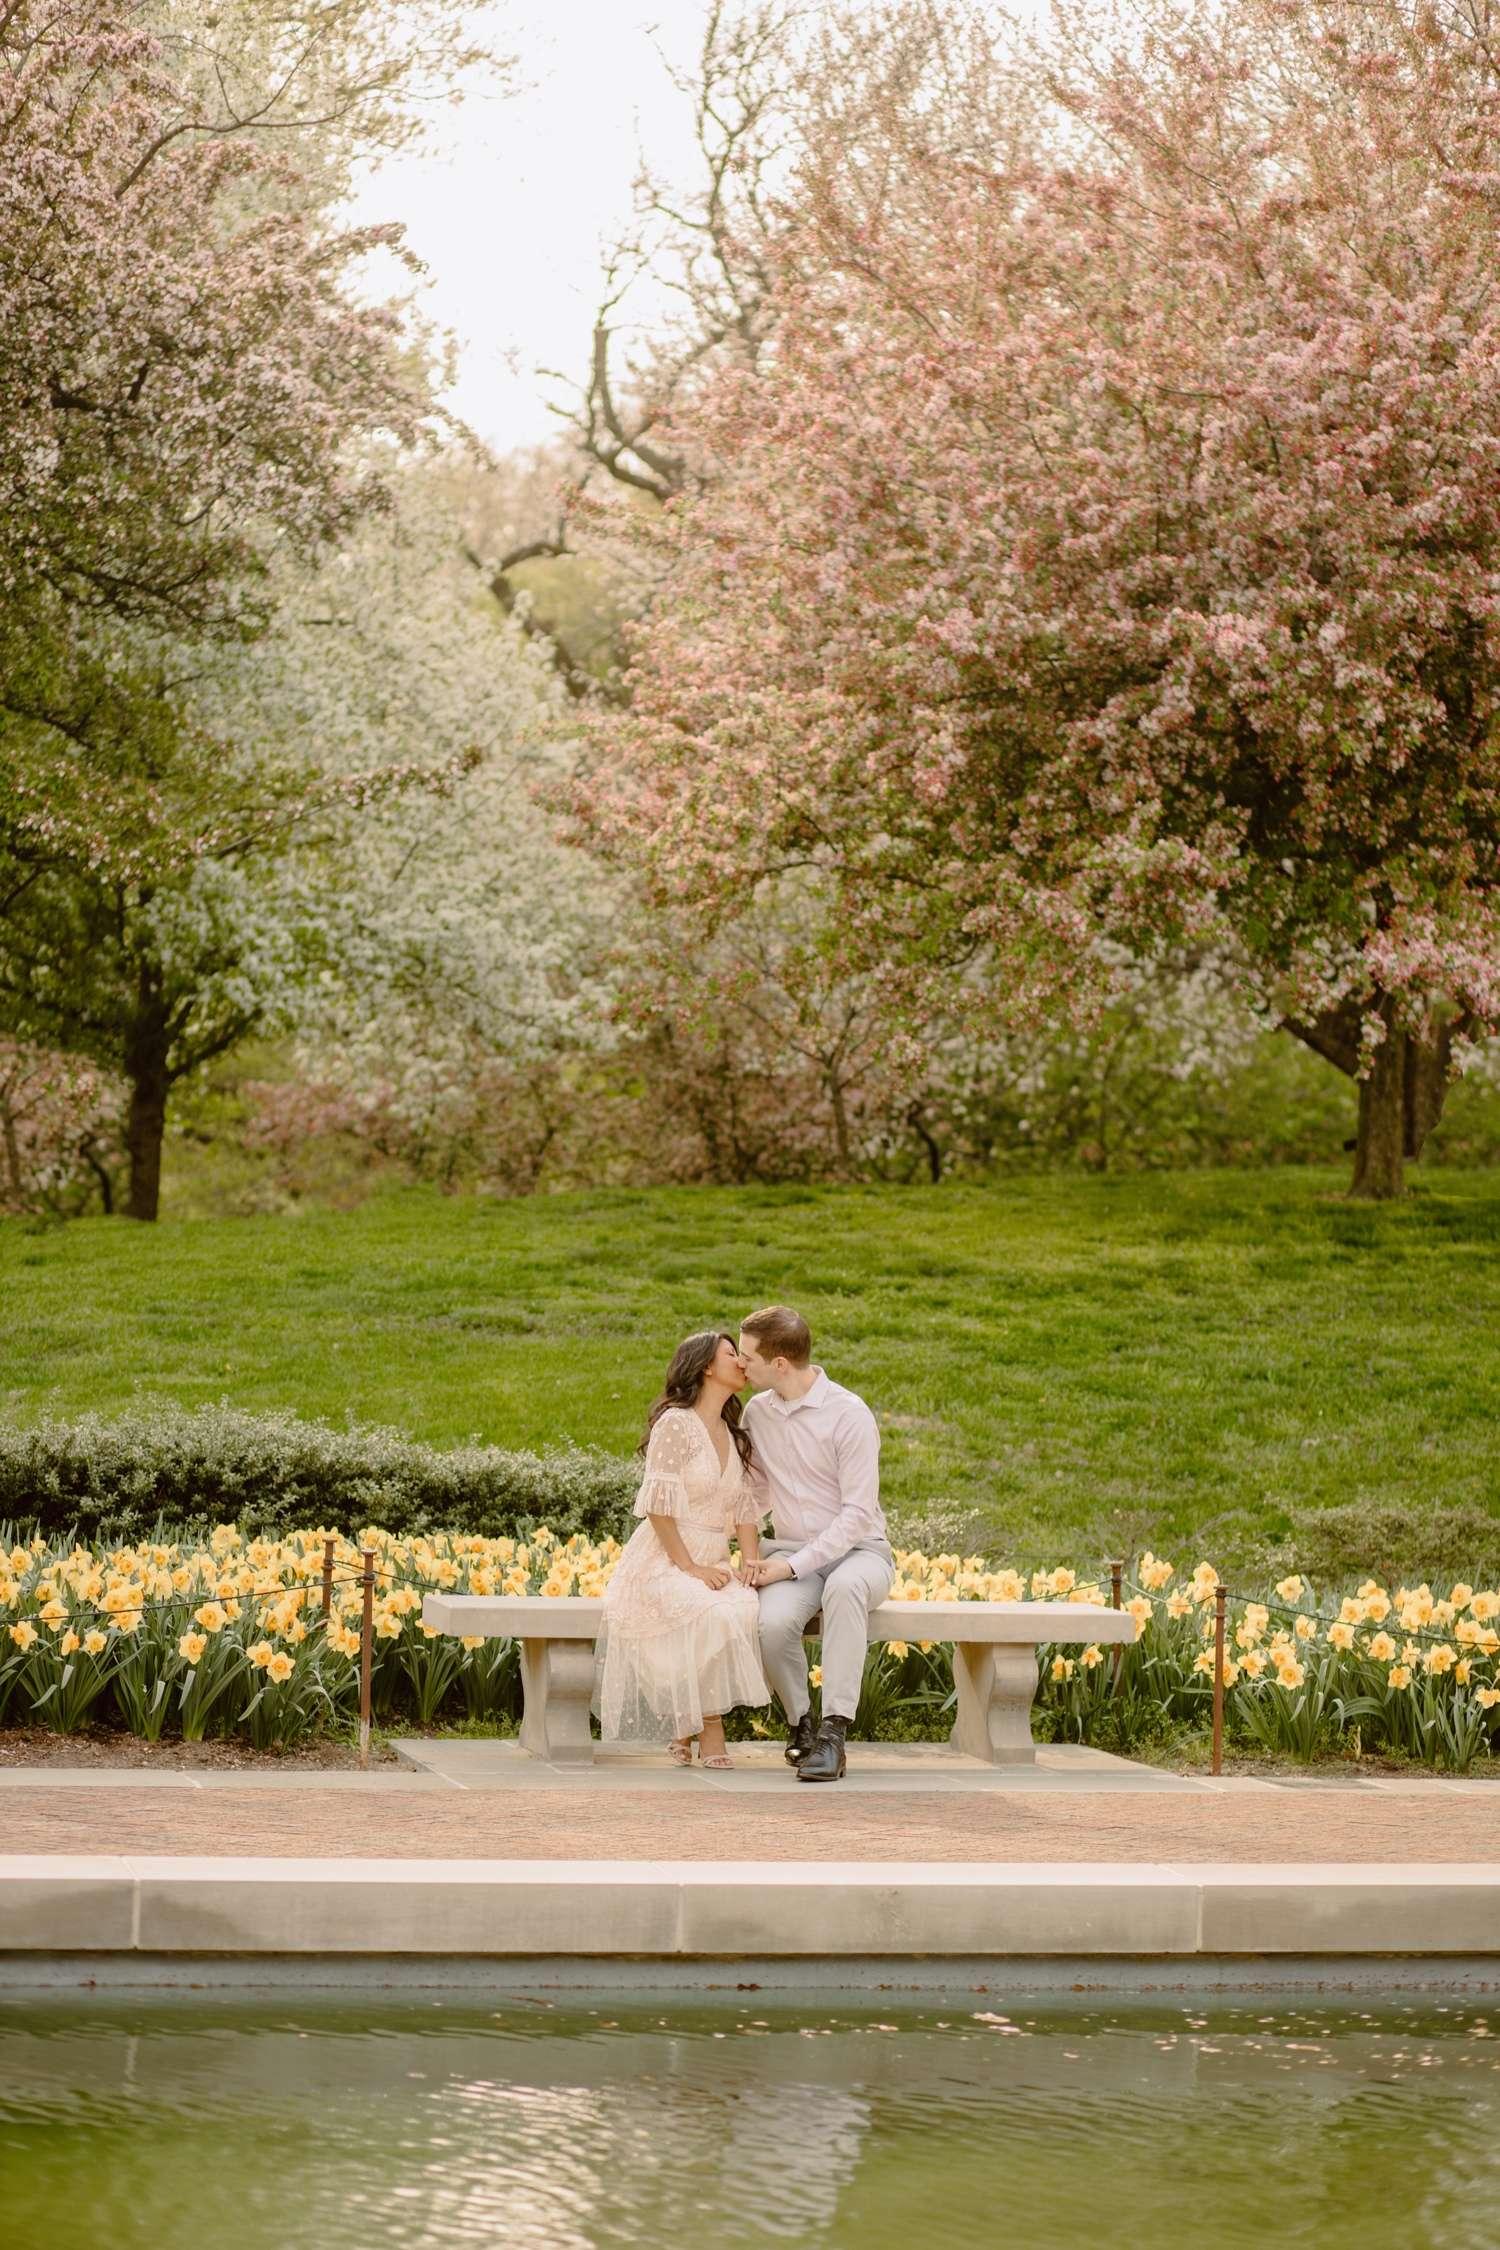 Spring at Brooklyn Botanic Garden